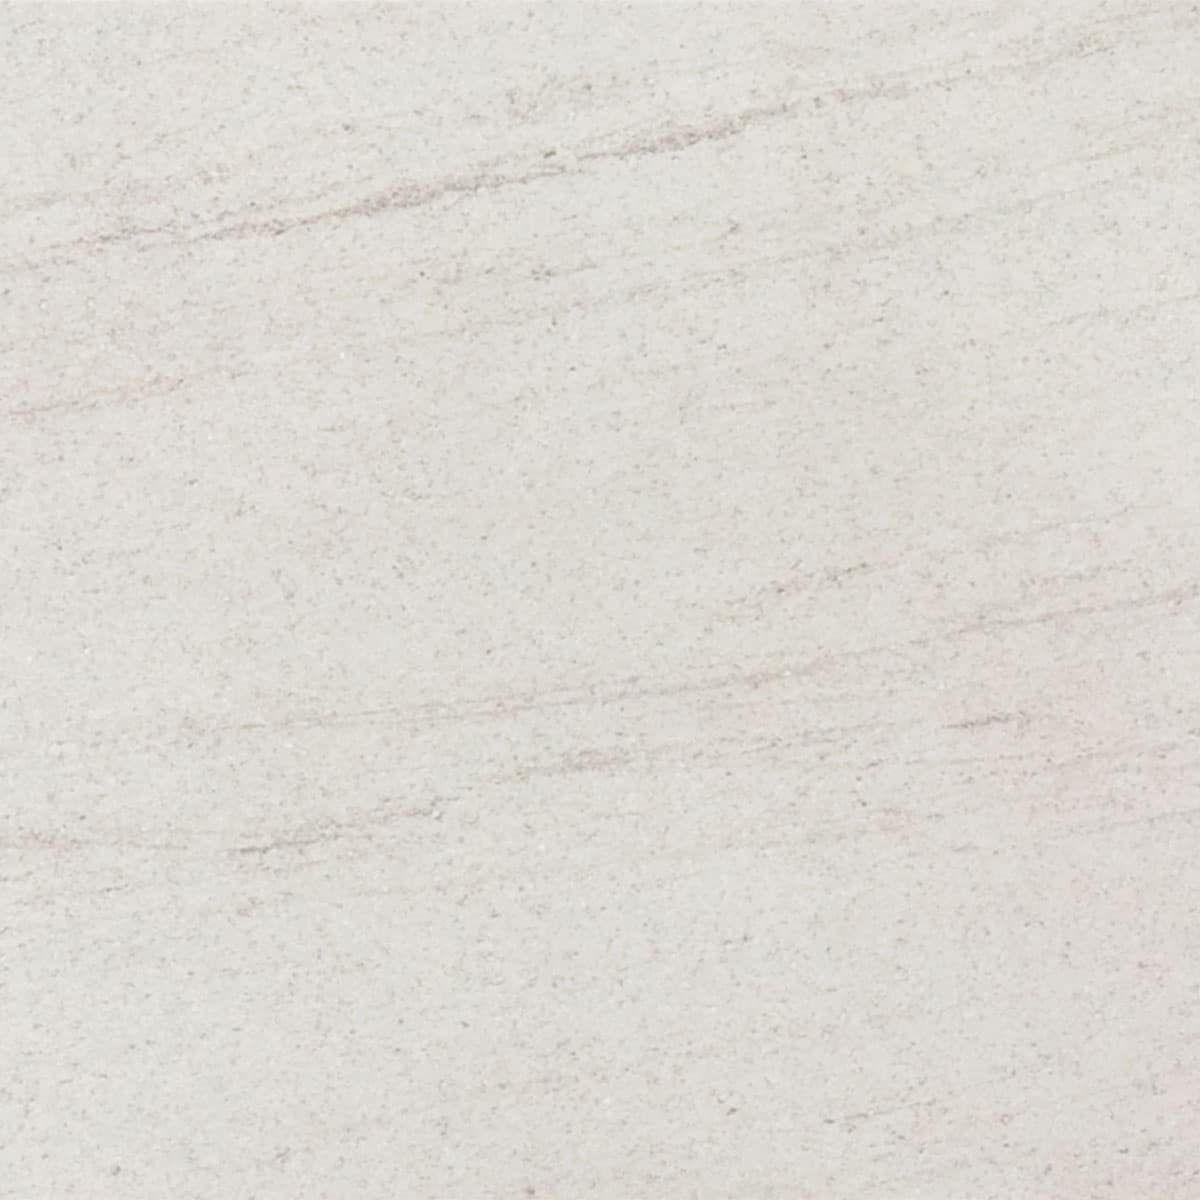 HF1812 Granit Light